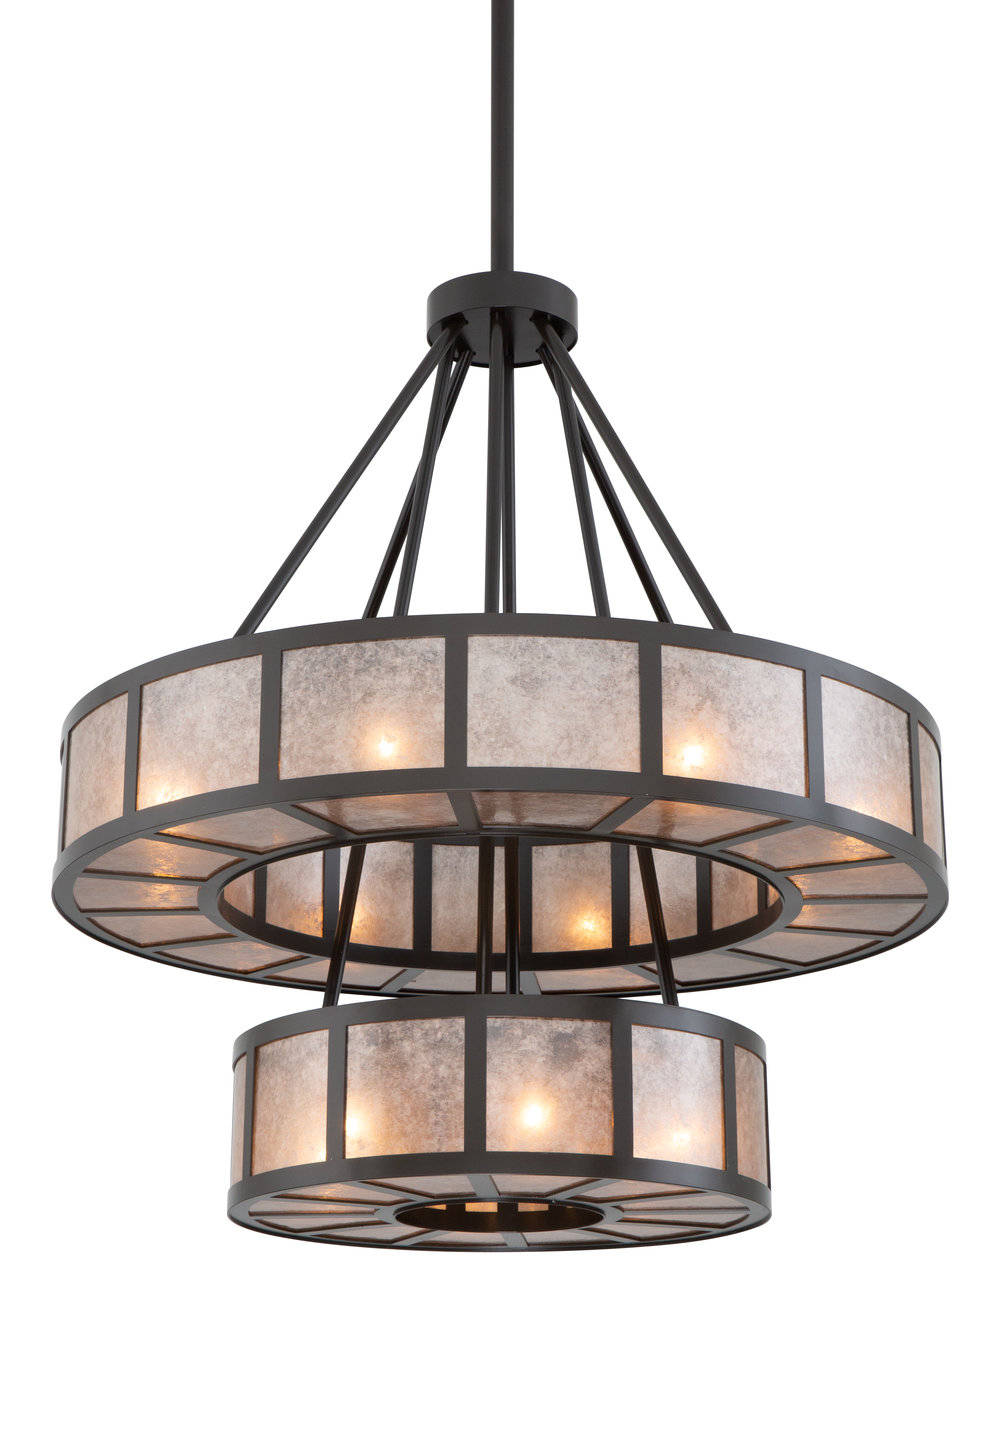 A popular contemporary chandelier, modified for a porte cochere installation. Custom design #CU-CH2249-17G-A